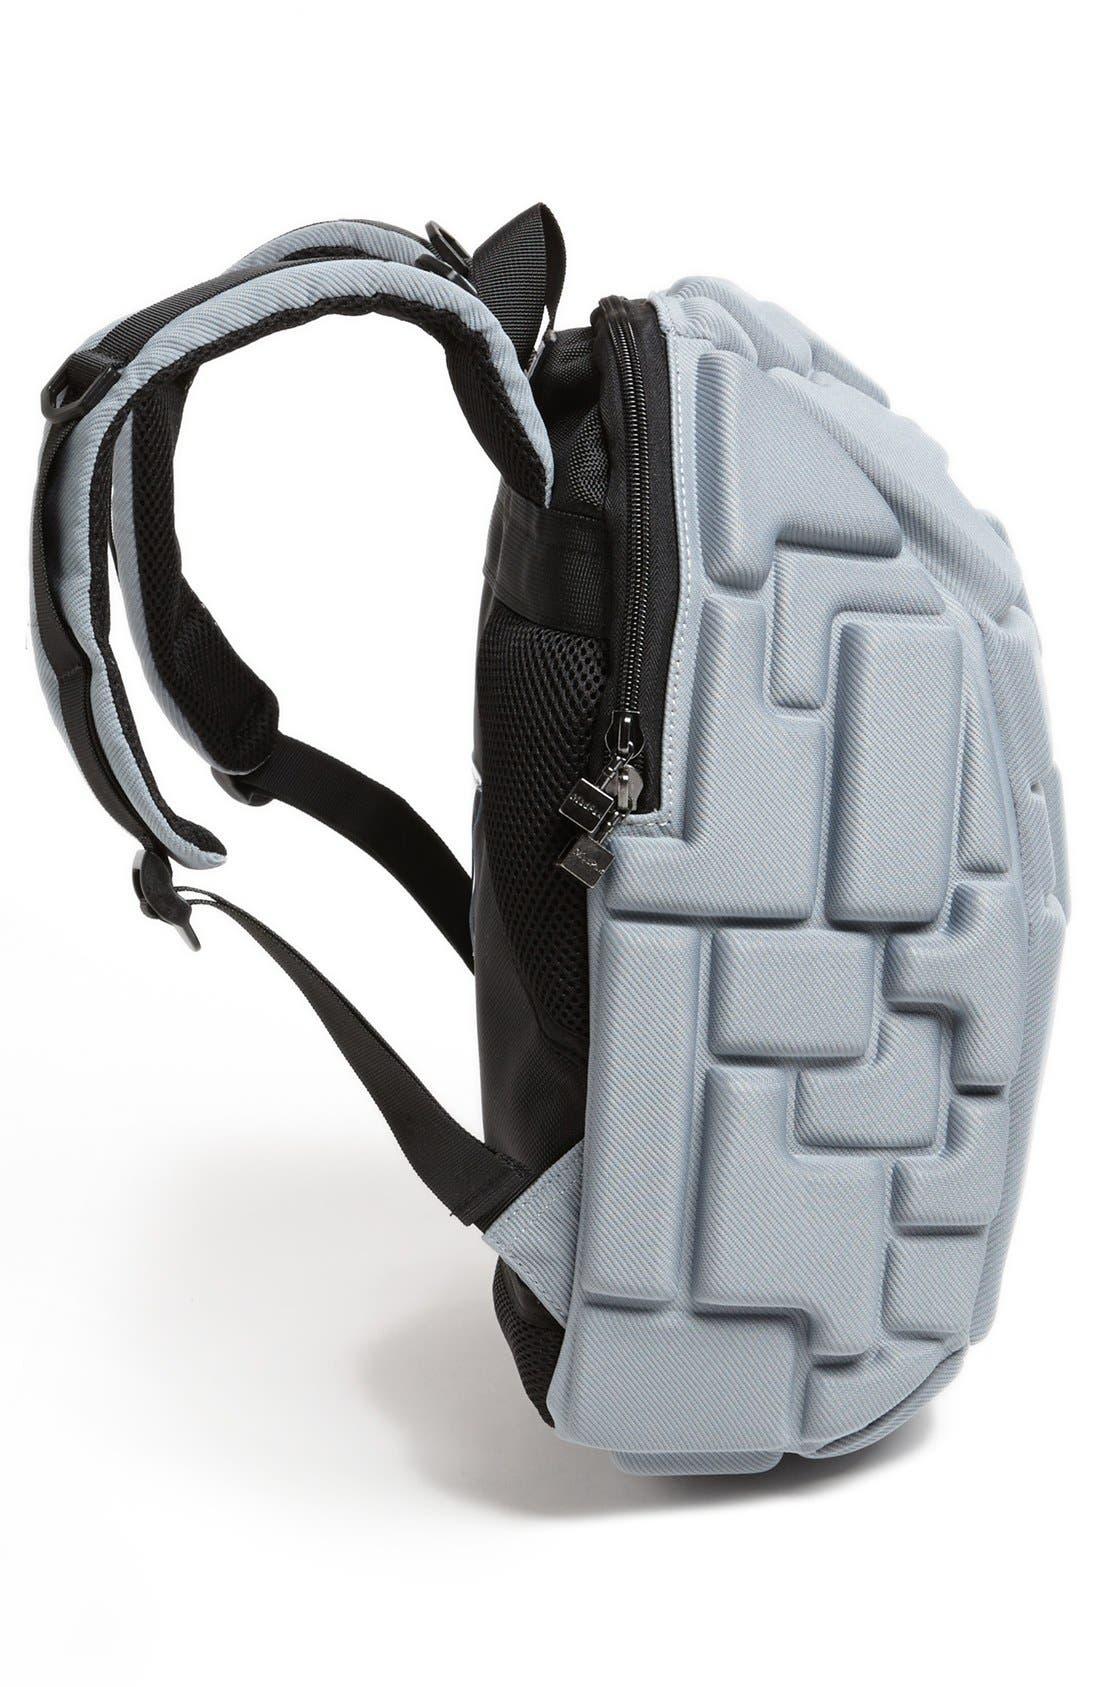 Alternate Image 2  - MadPax 'The Blok' Half-Pack Backpack (Toddler Boys & Little Boys)